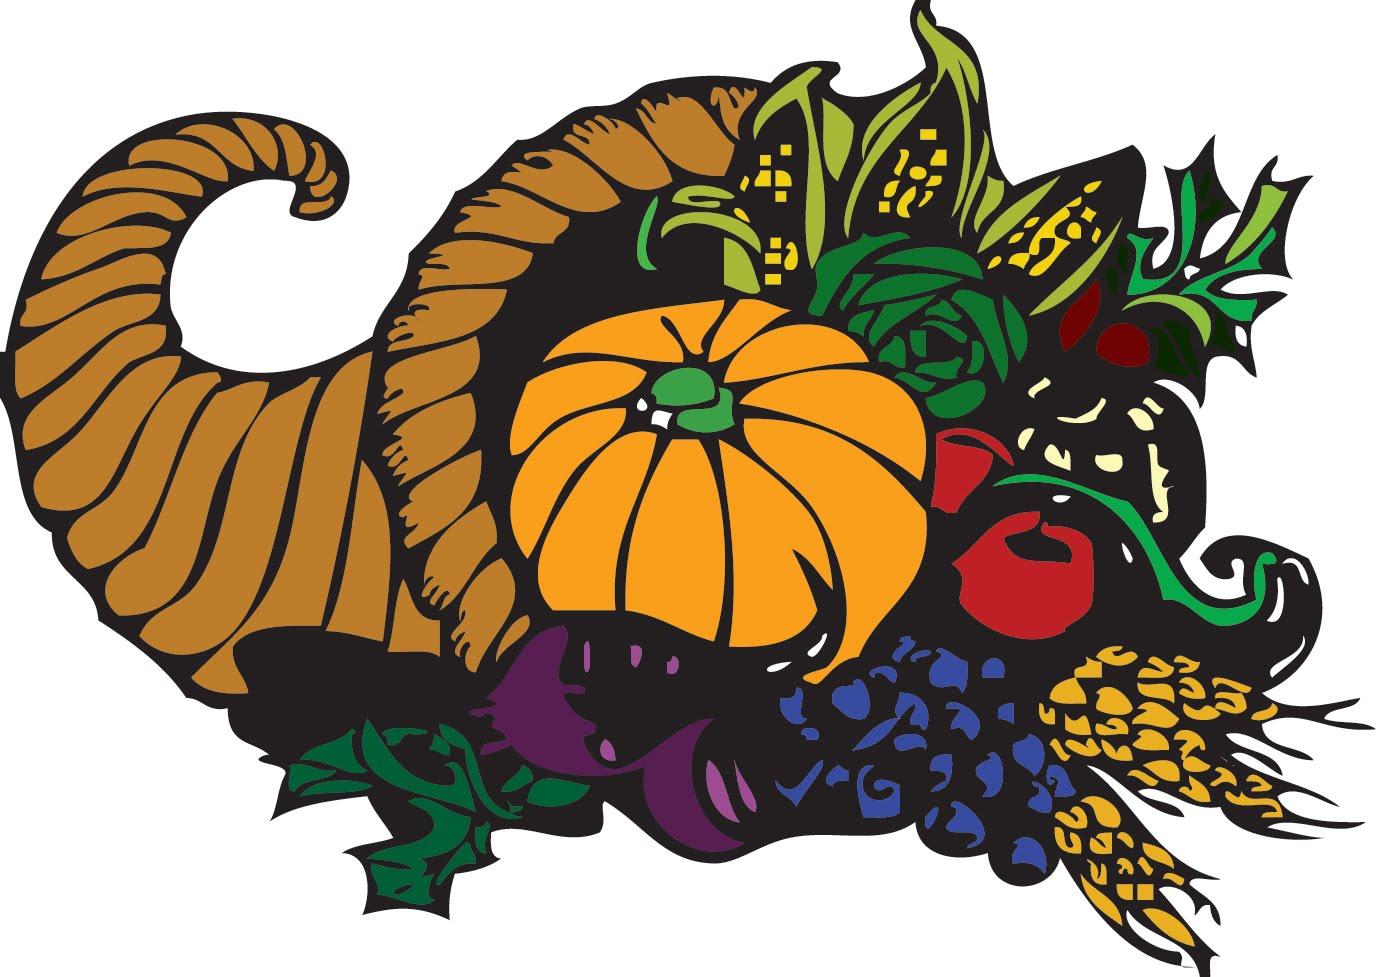 Pix For U0026gt; First Thanksgiving .-Pix For u0026gt; First Thanksgiving .-8